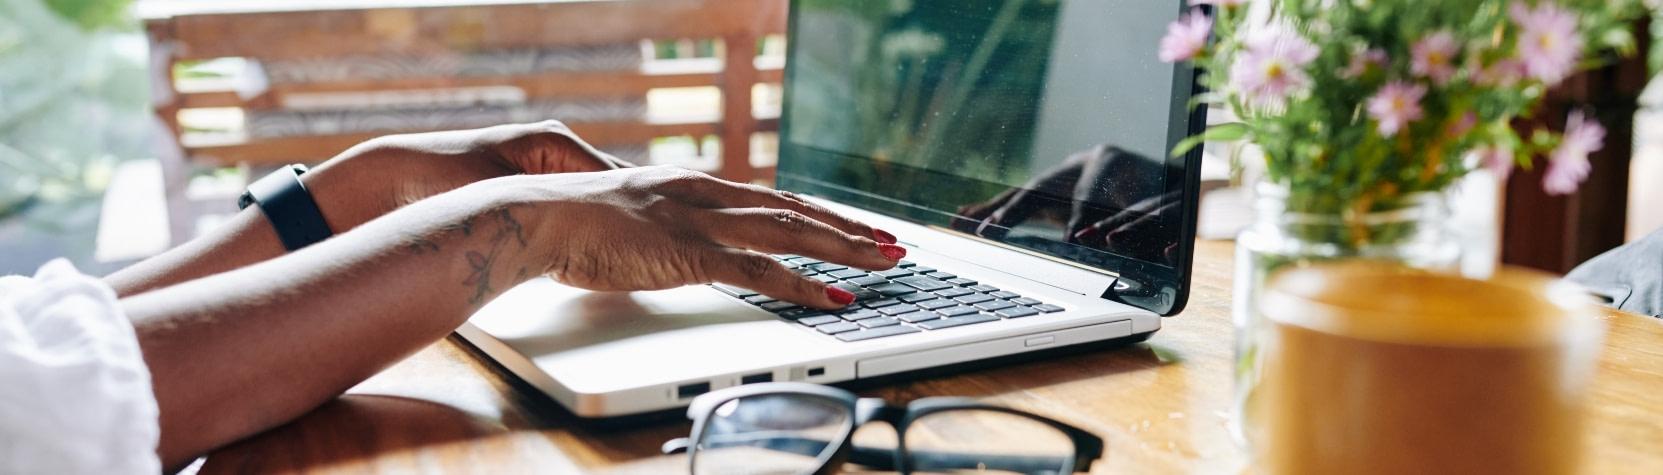 Vds training consutants blog hybride leiderschap